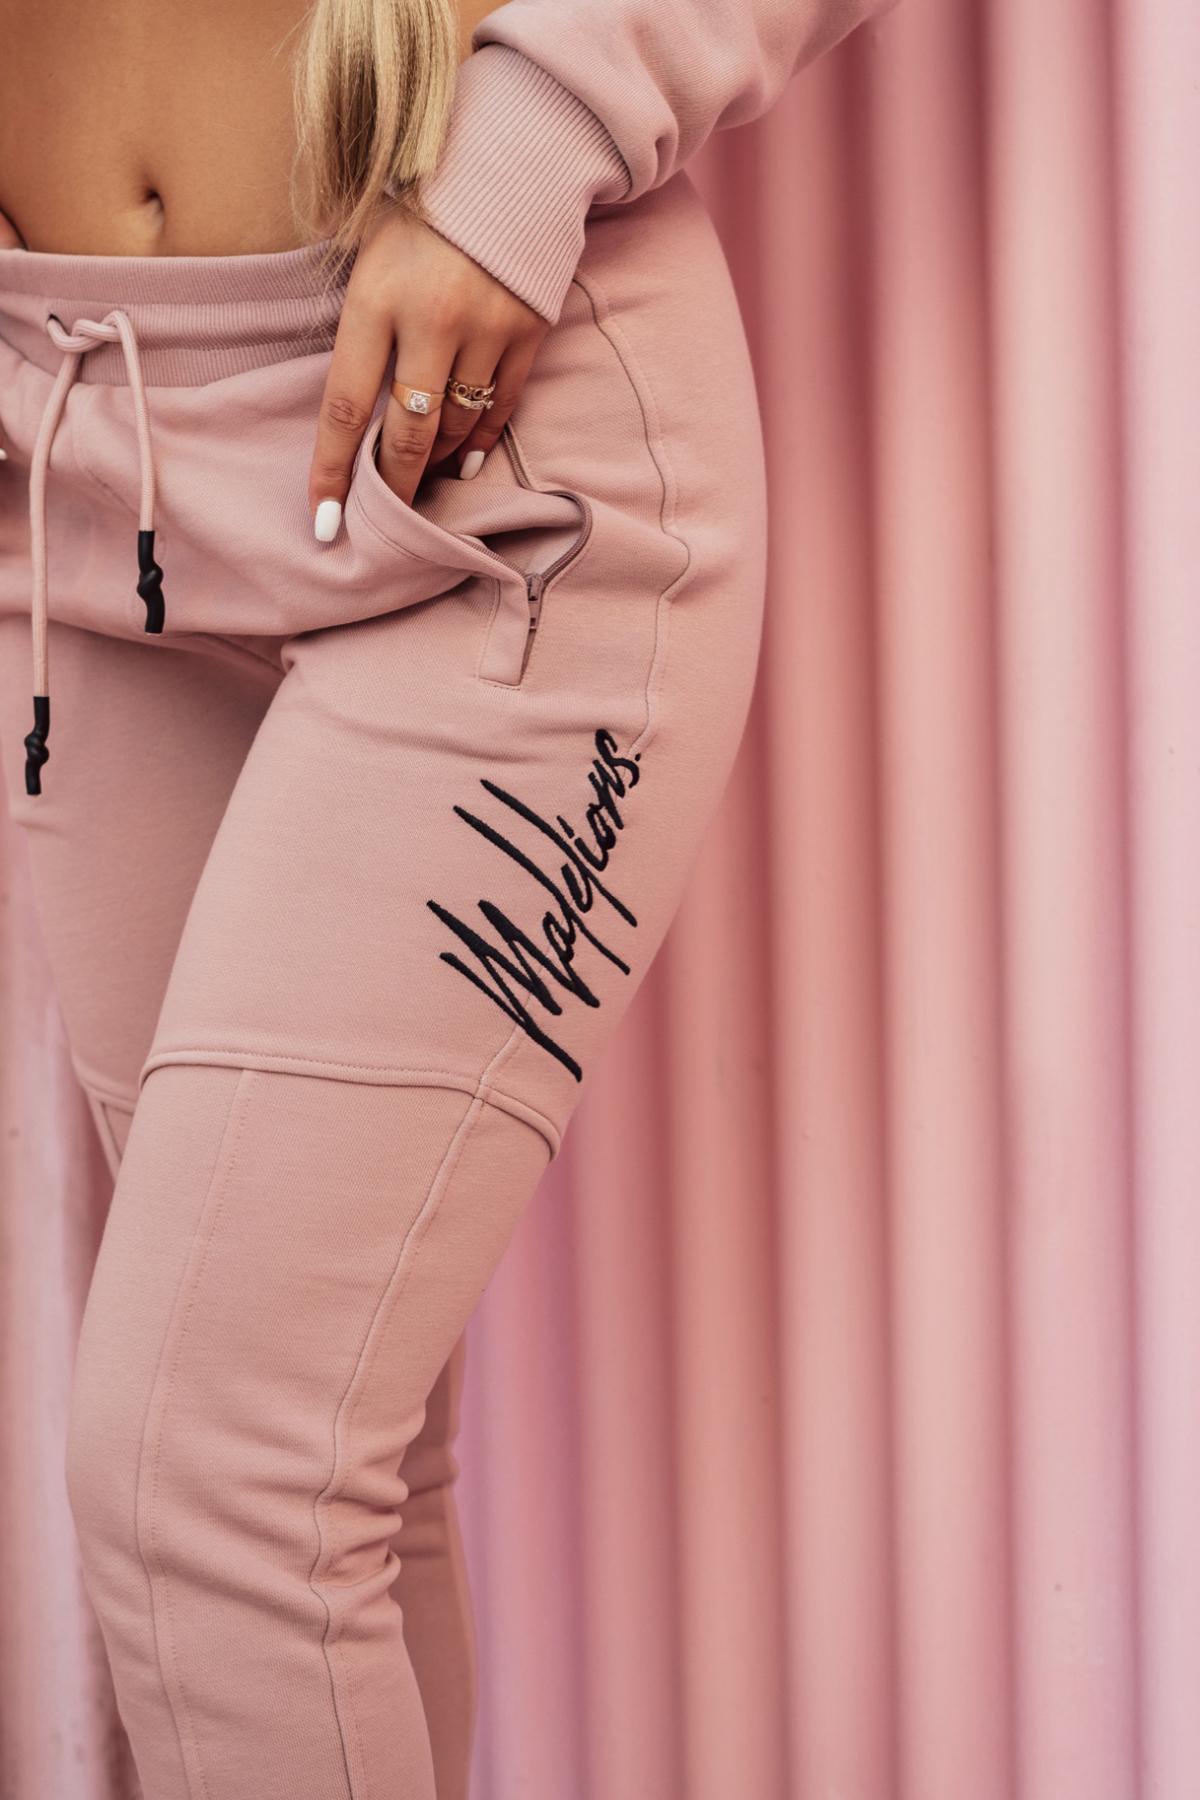 Malelions Women Multi Trackpants – Mauve/Dark Antra New